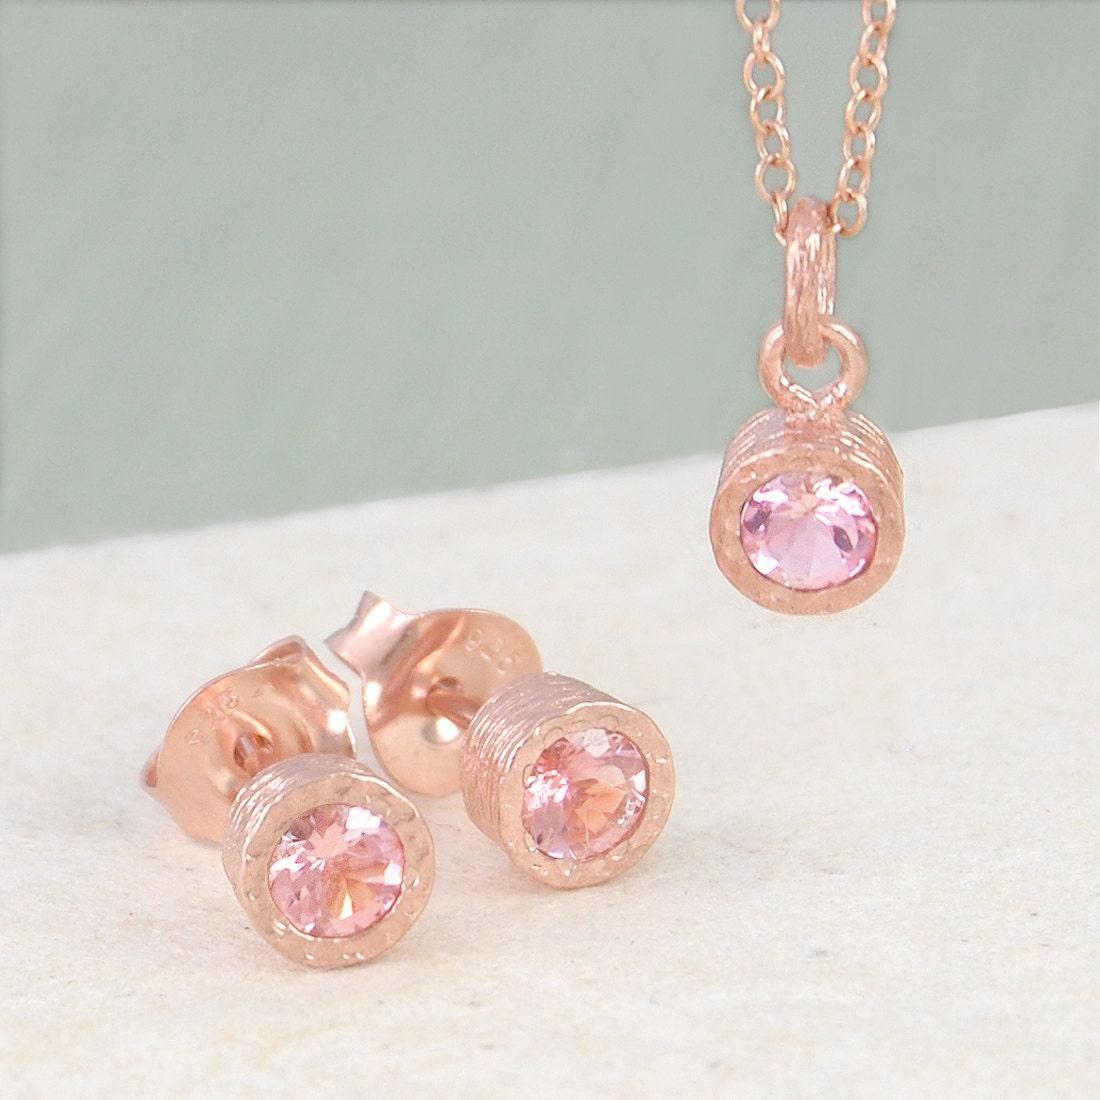 pink tourmaline jewelry set tourmaline pendant rose gold. Black Bedroom Furniture Sets. Home Design Ideas